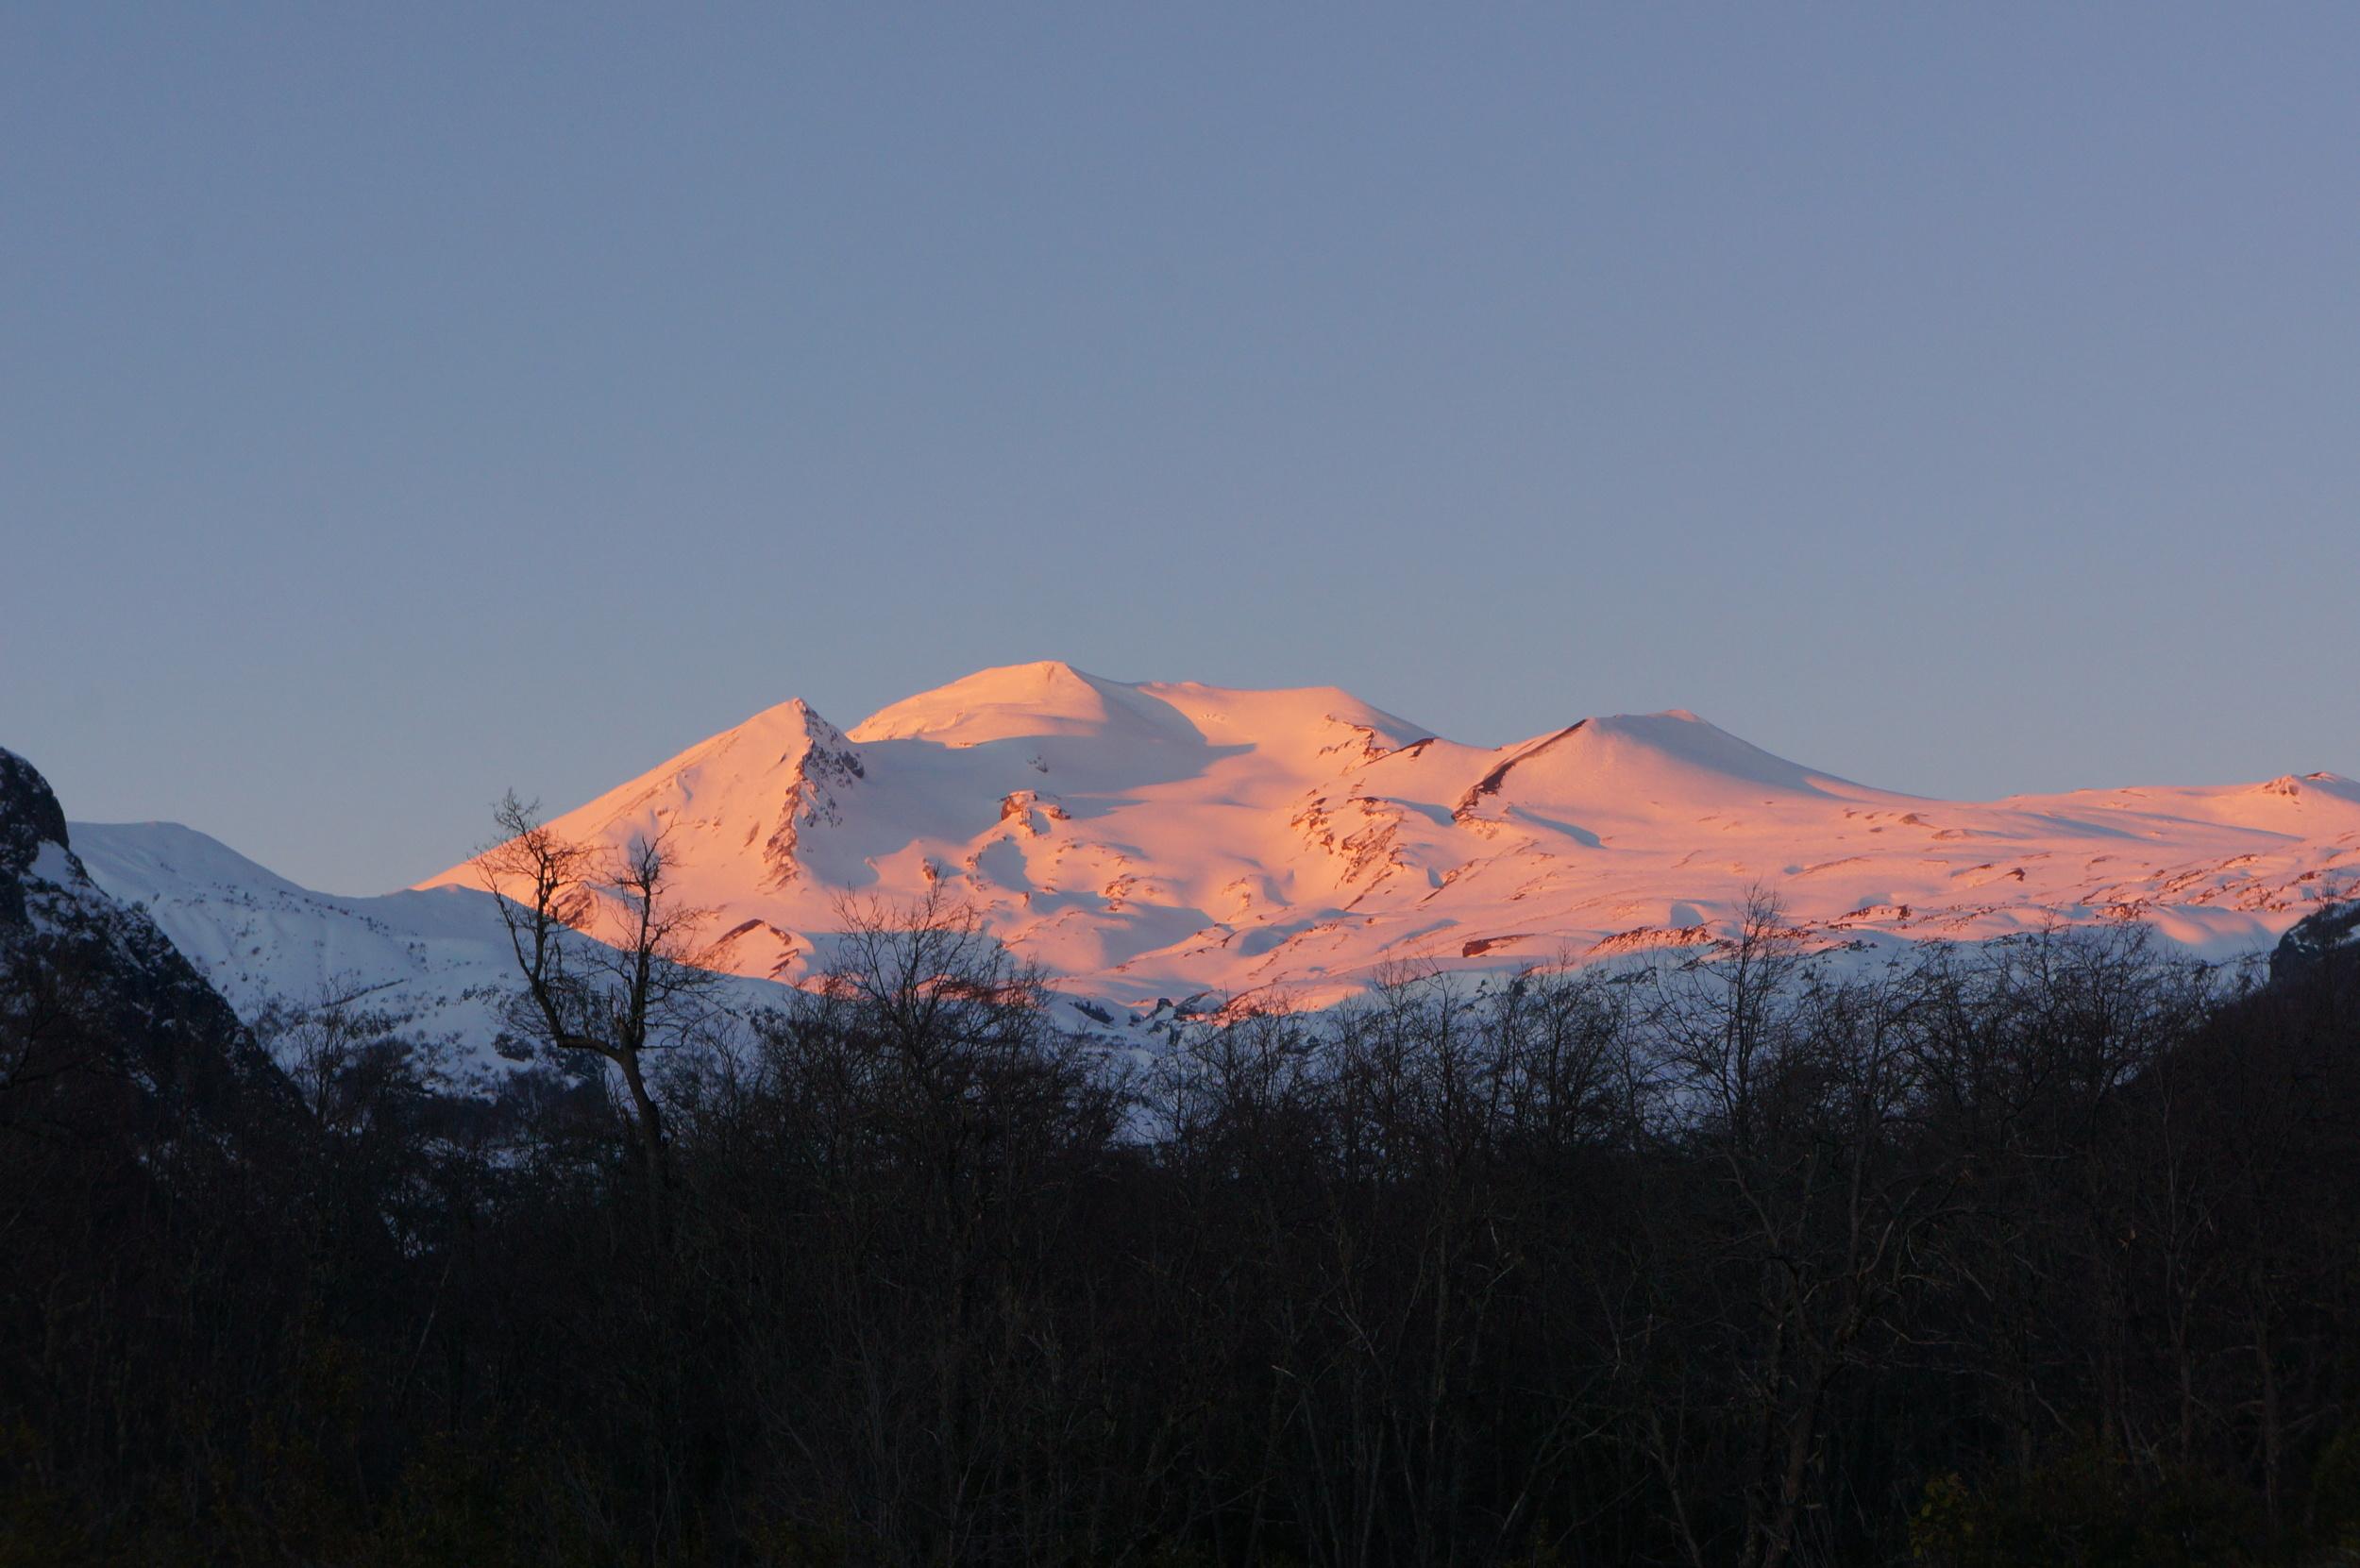 Sunset on Volcán Nevados de Chillan